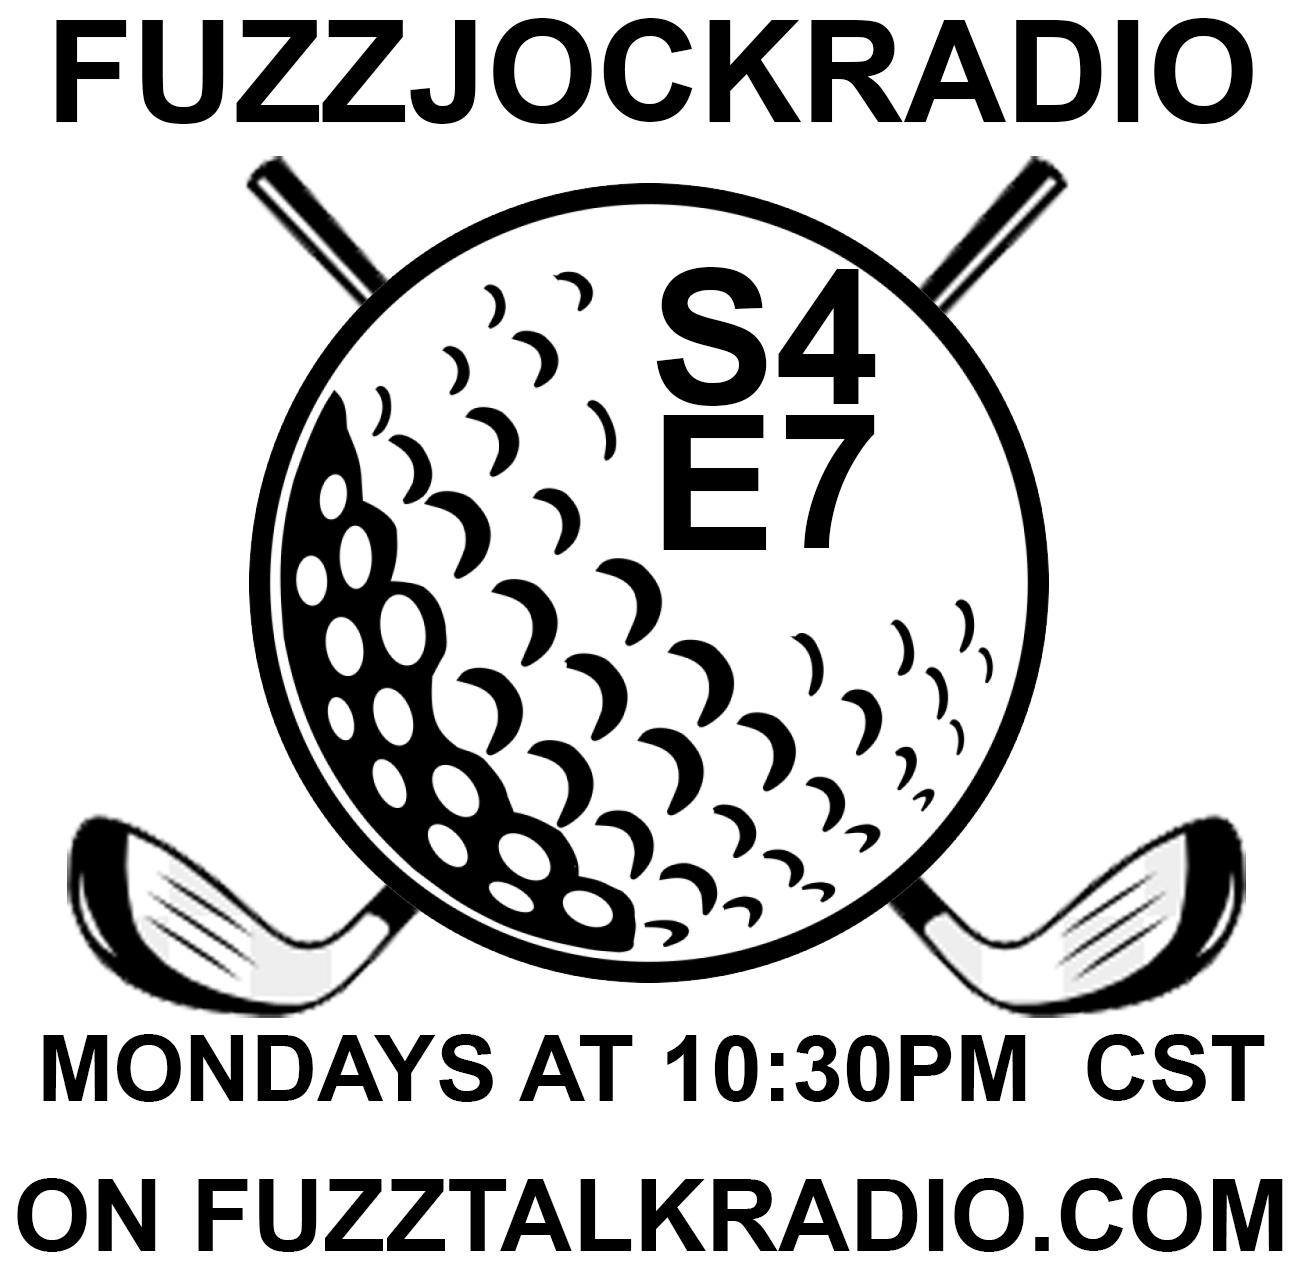 FuzzJockRadio - Will It Ever End?